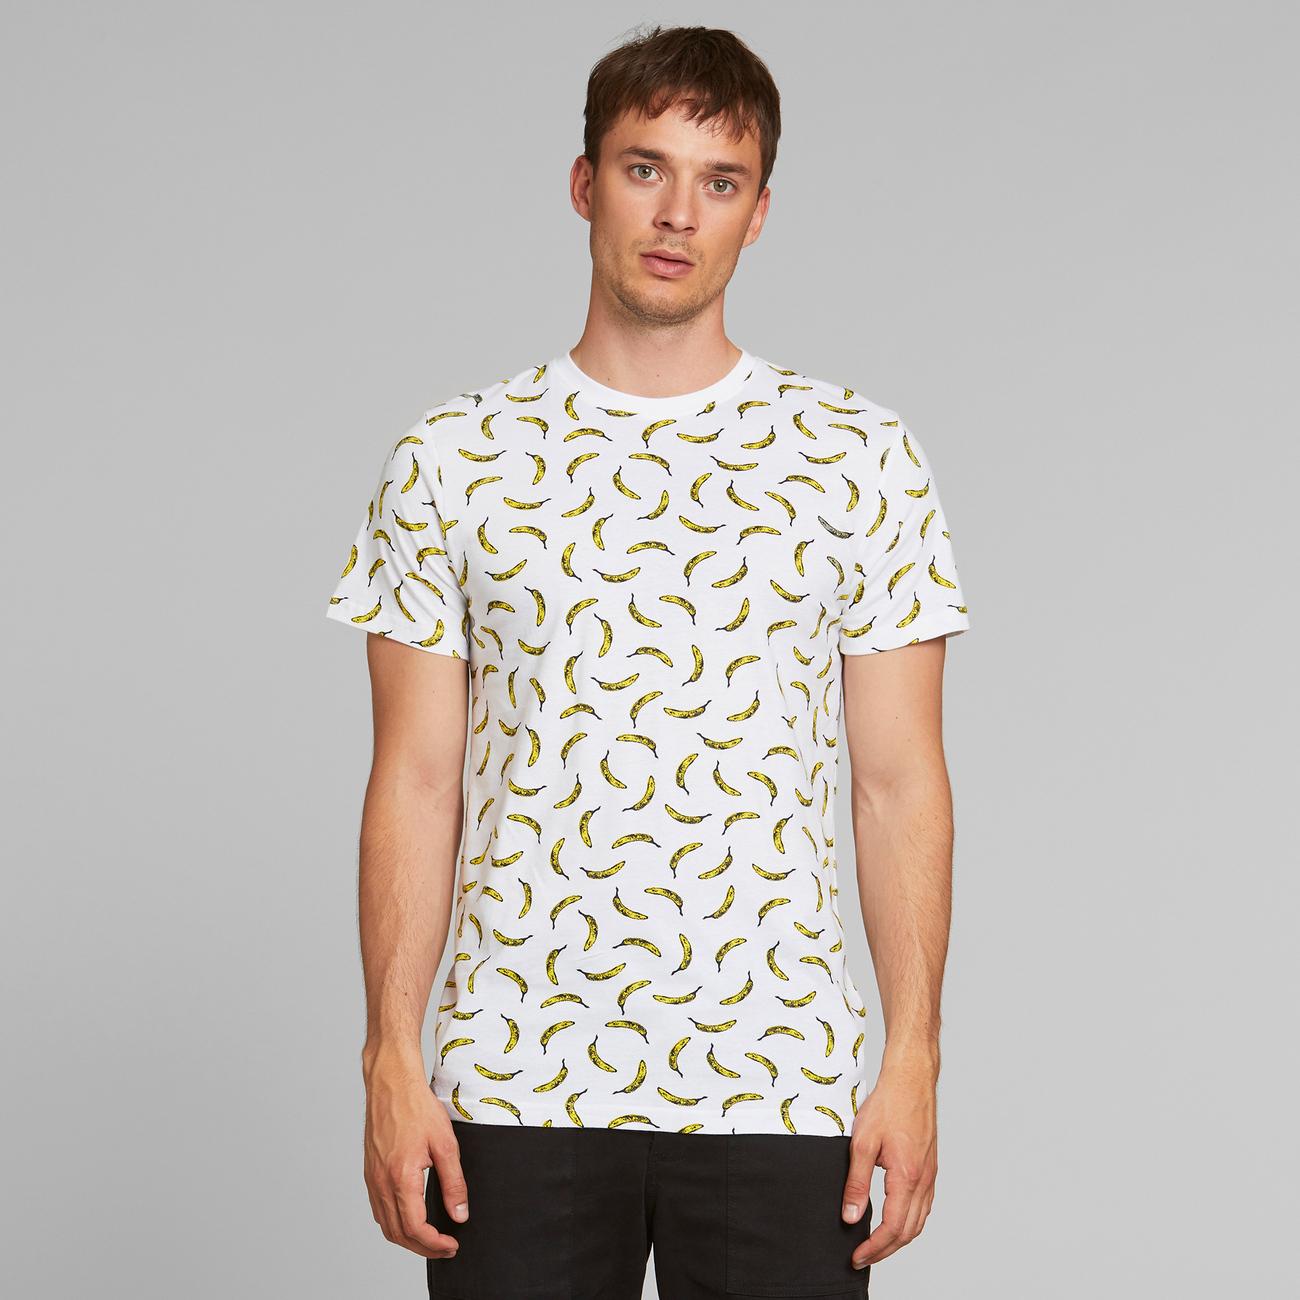 T-shirt Stockholm Bananas White